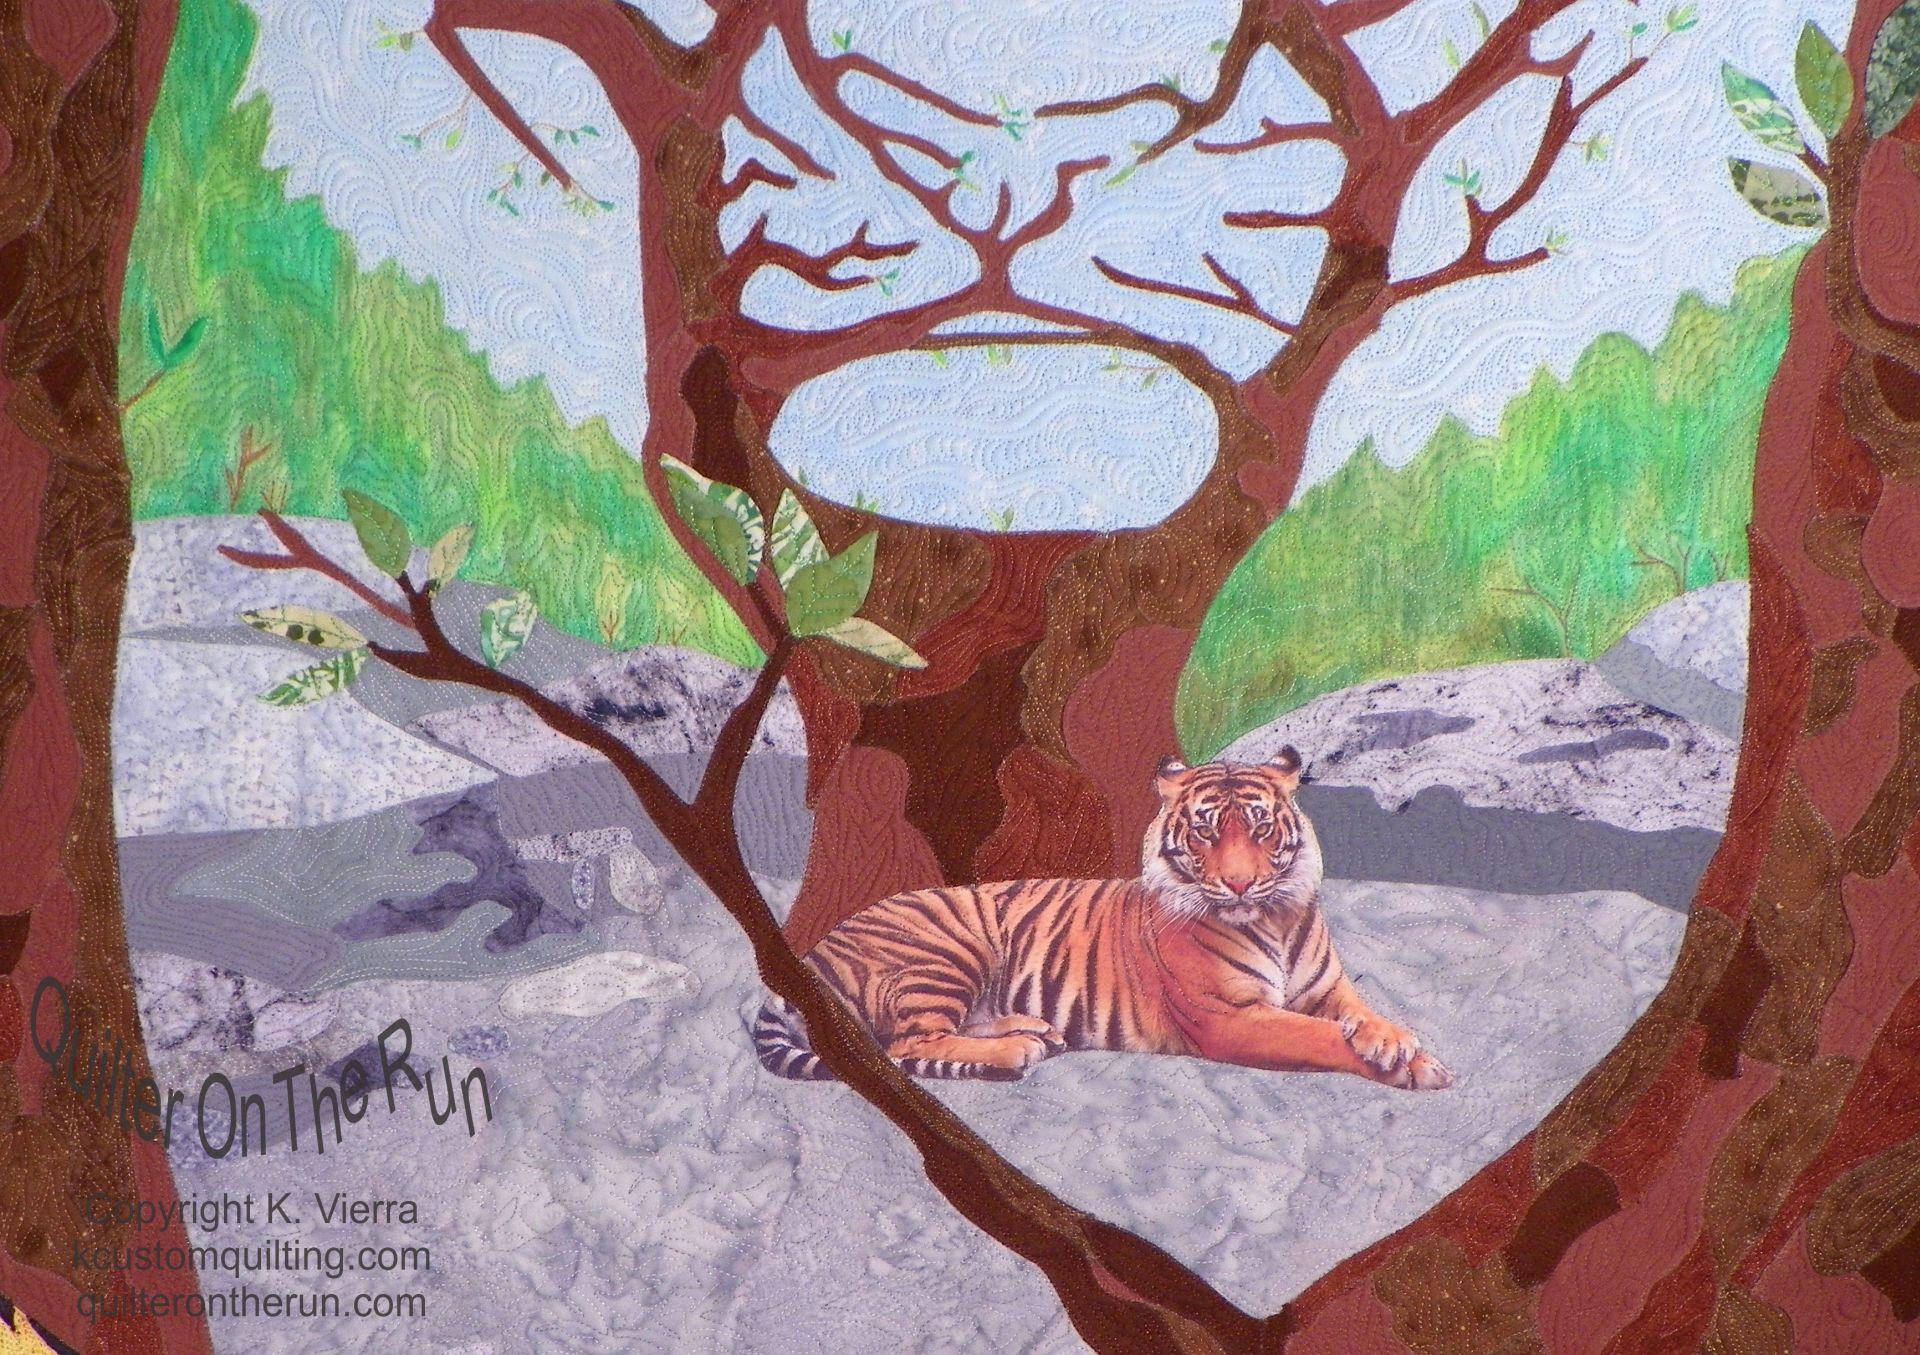 hidden tiger optical illusion printed fabric quilting